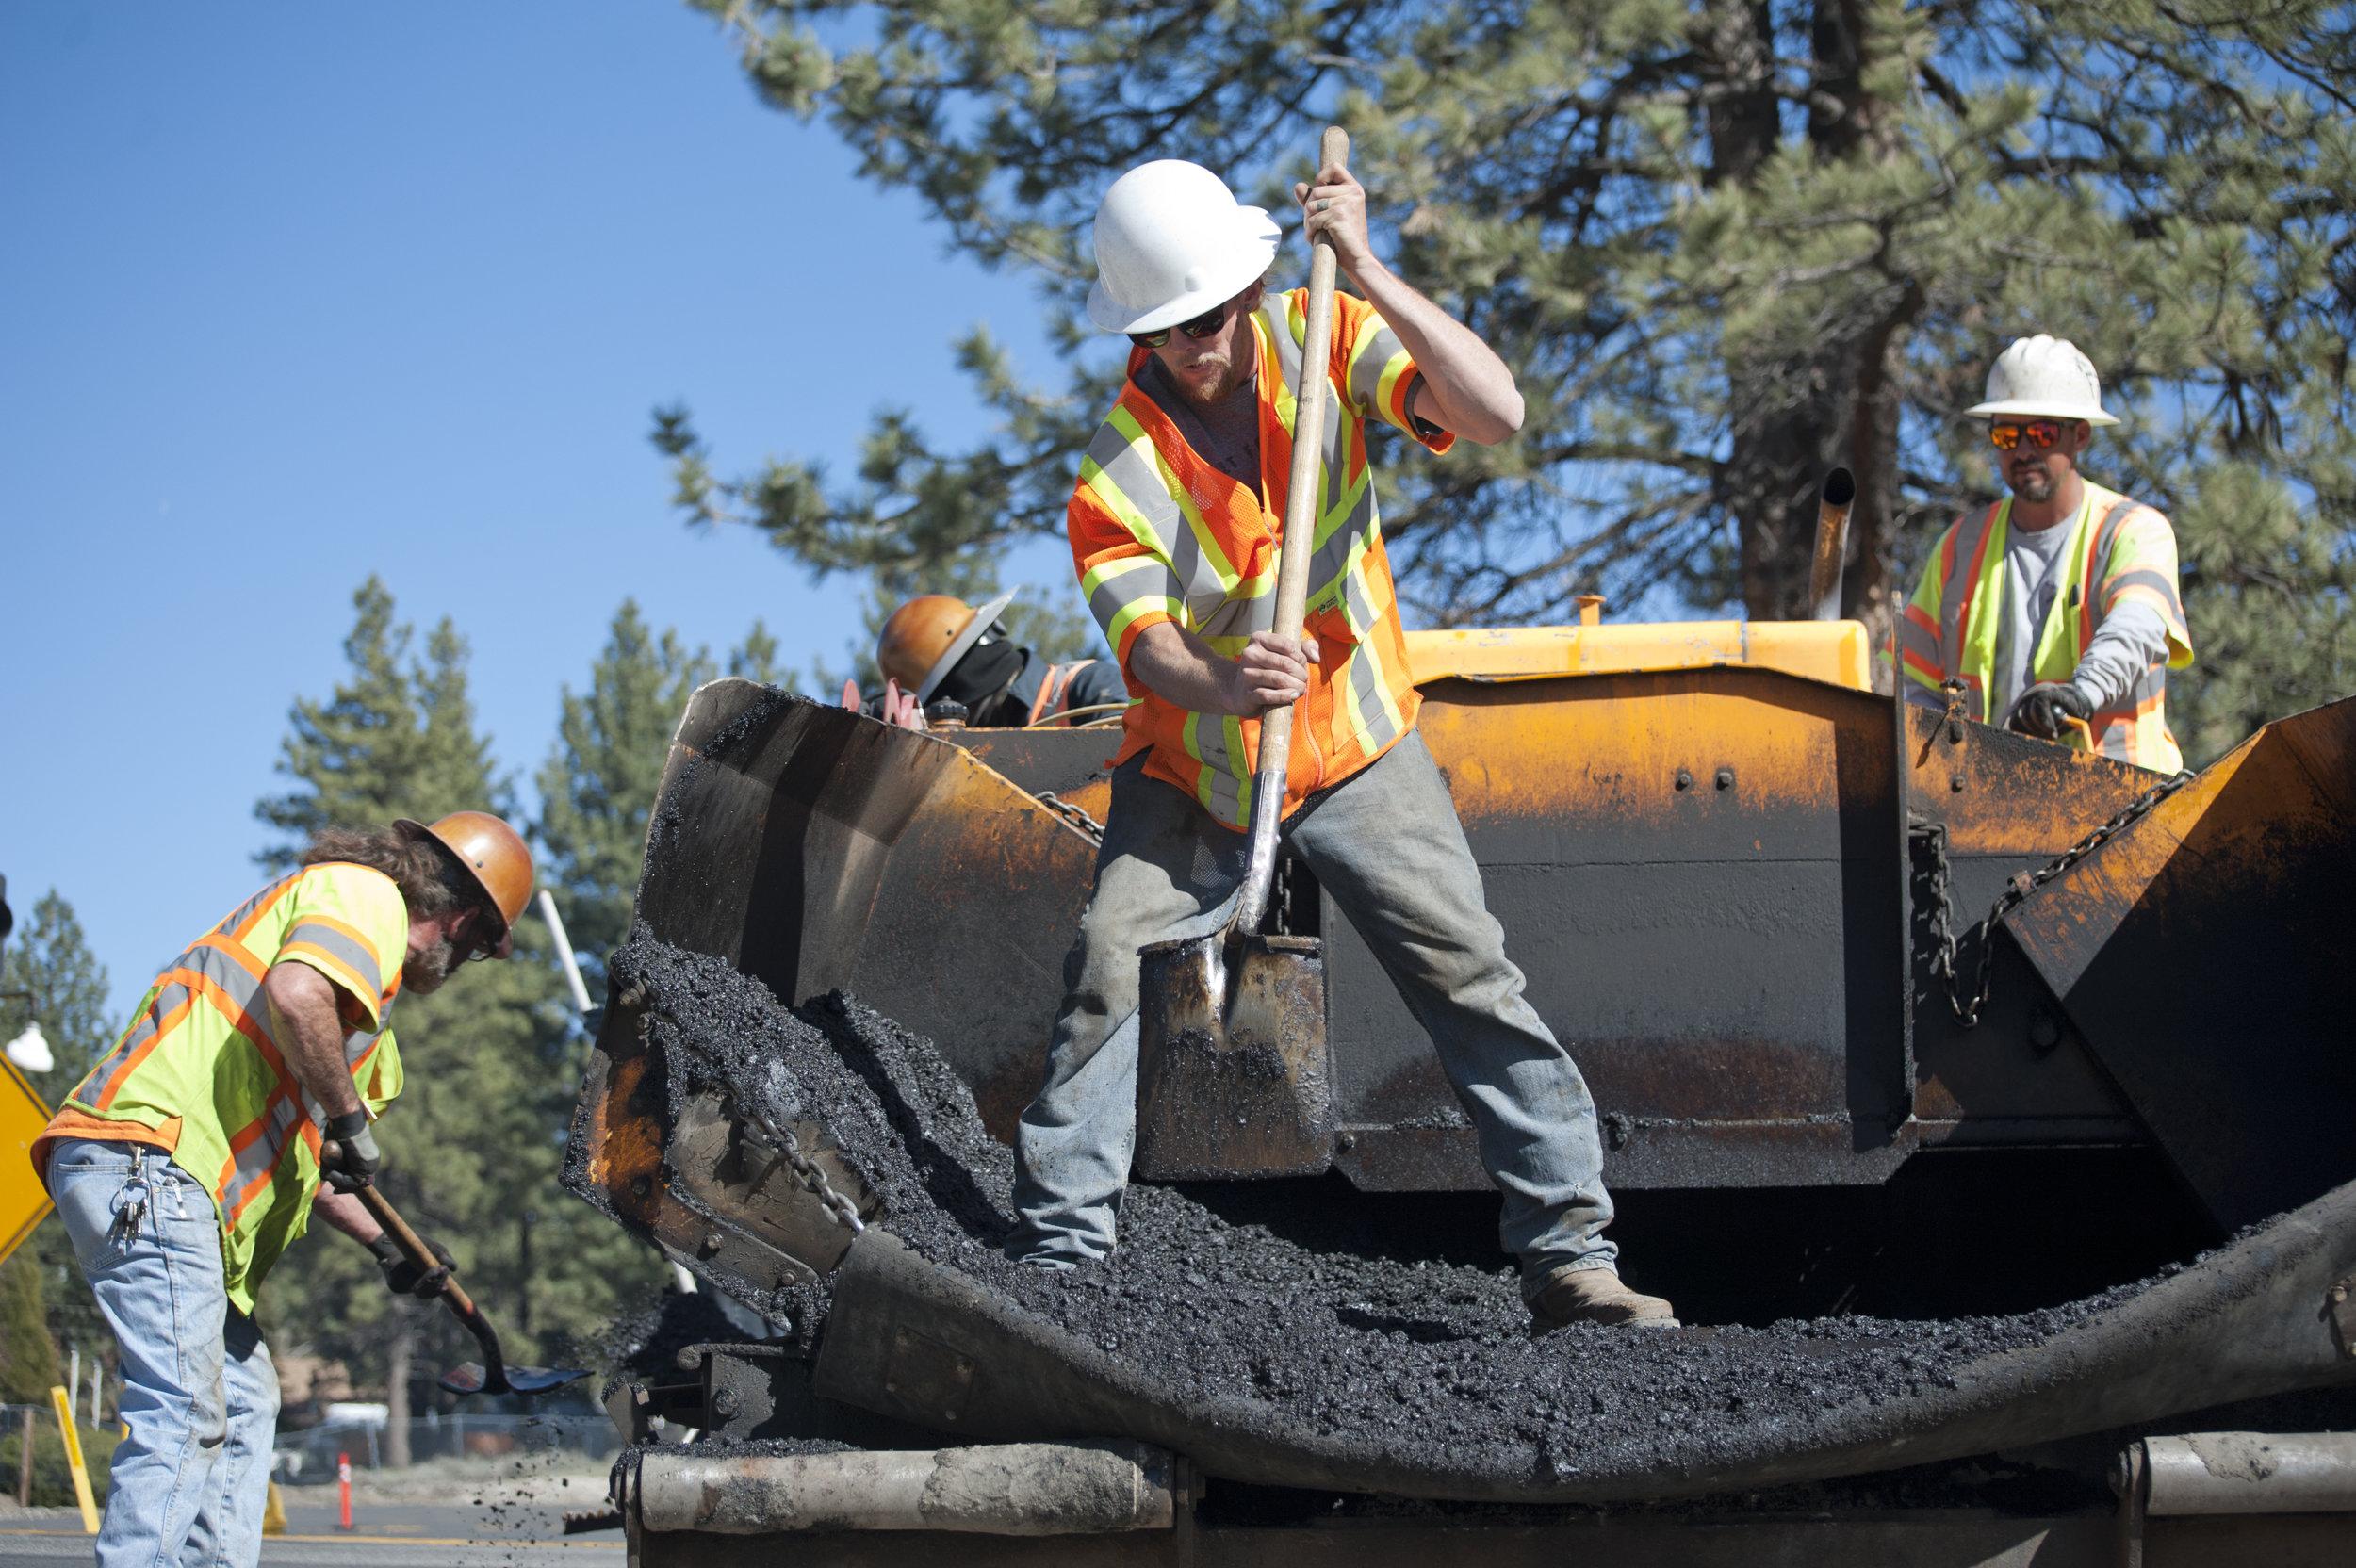 Matt Hayes, center, consolidates the asphalt mix while Bear Valley Paving crews work to expand Big Bear Boulevard April 20, 2017.